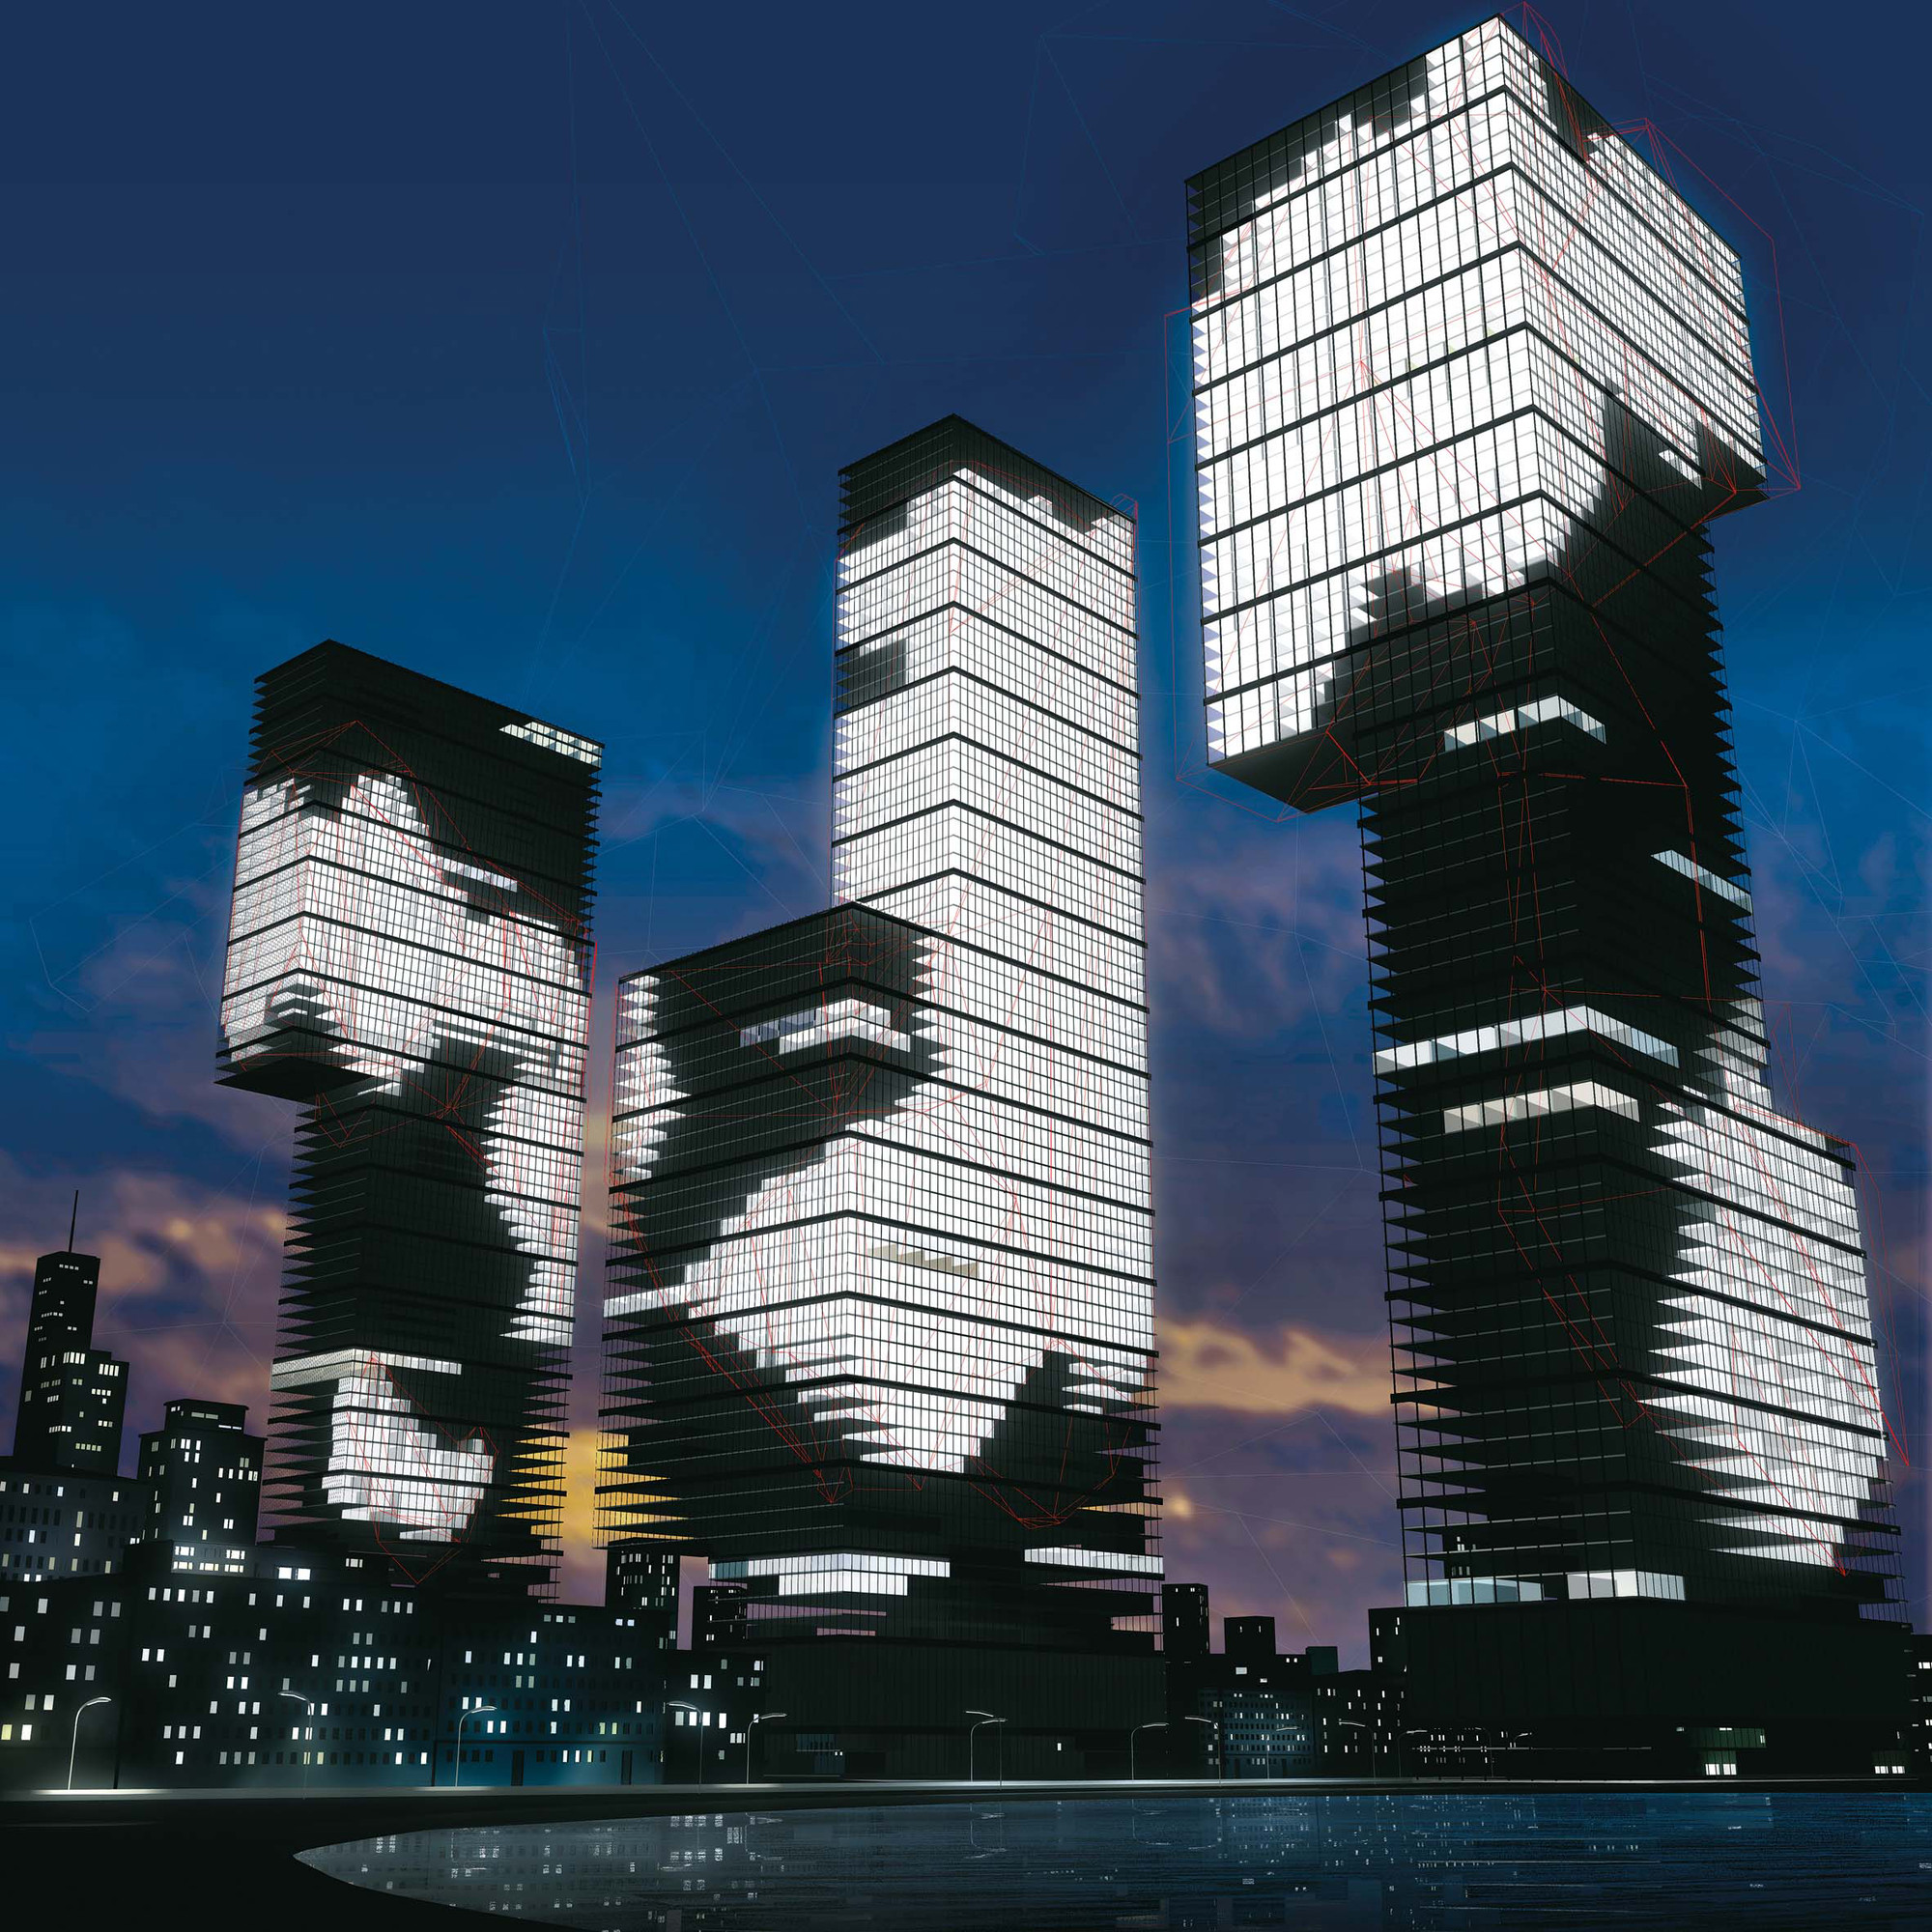 Realities:united, NIX, simulation drawing, 2005. Exhibition: Lightopia, Gent. Image © realities:united